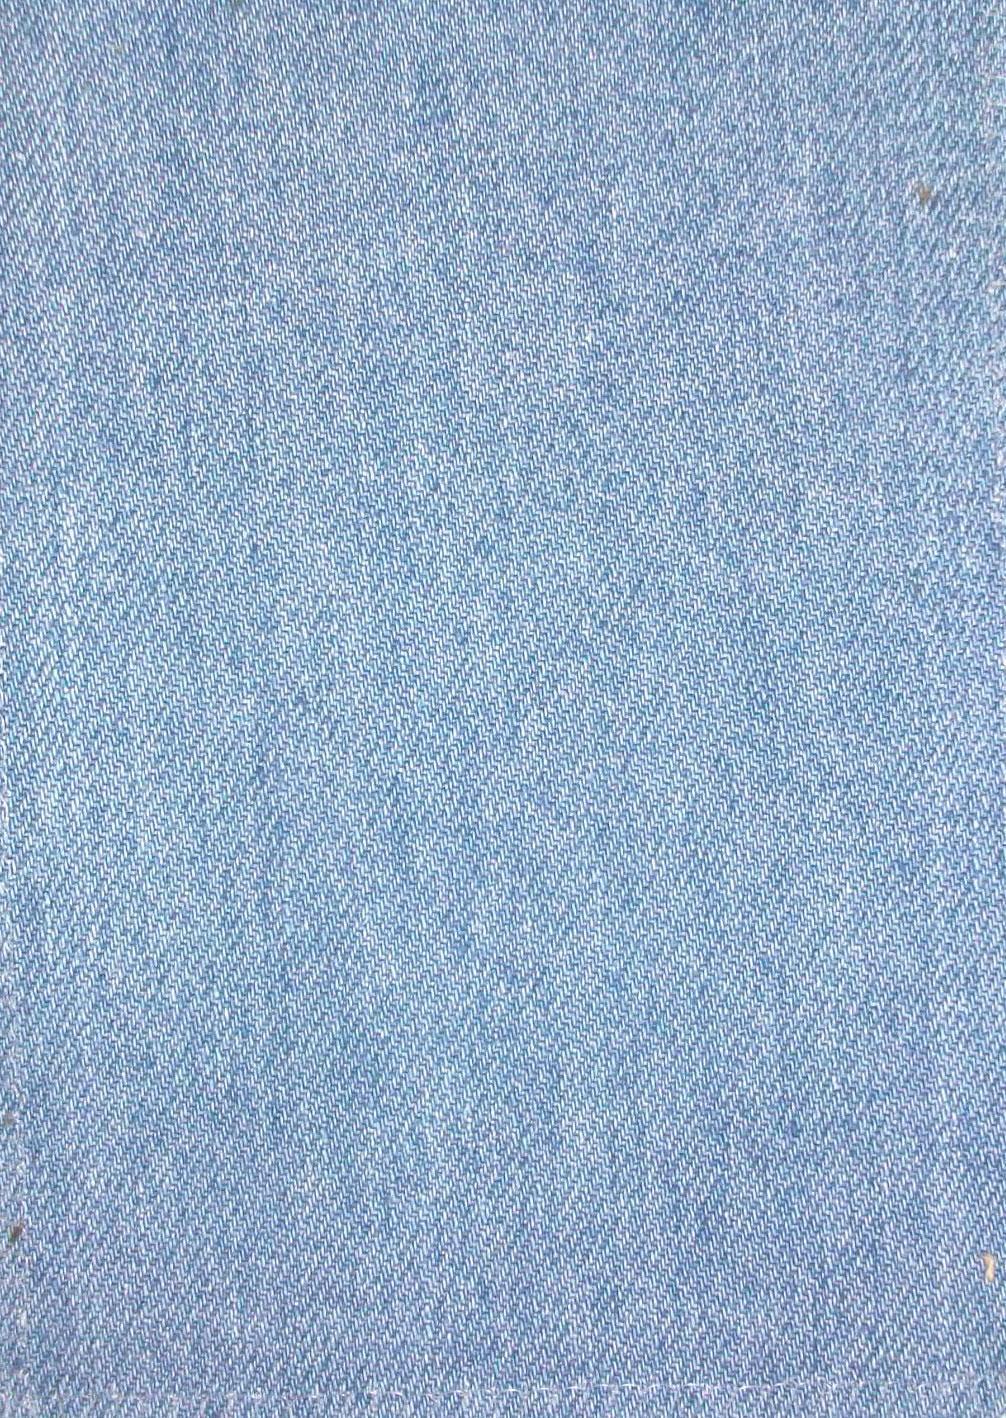 Stroheim fabrics sconset beach denim chambray for Chambray fabric